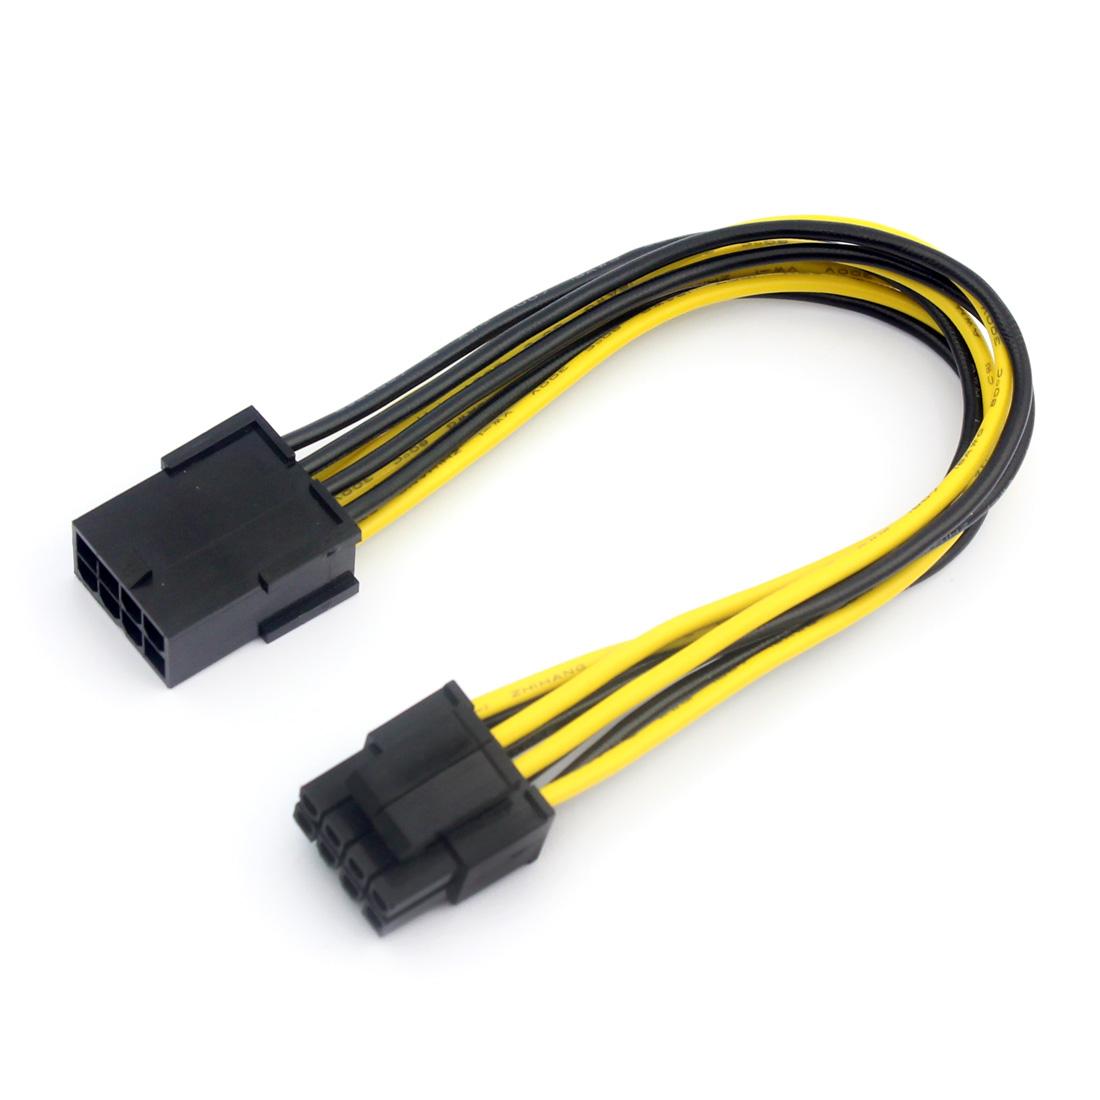 US$ 0.61 - Graphics 8P to CPU 8Pin (4pin +4pin ) Power Cable Adapter ...